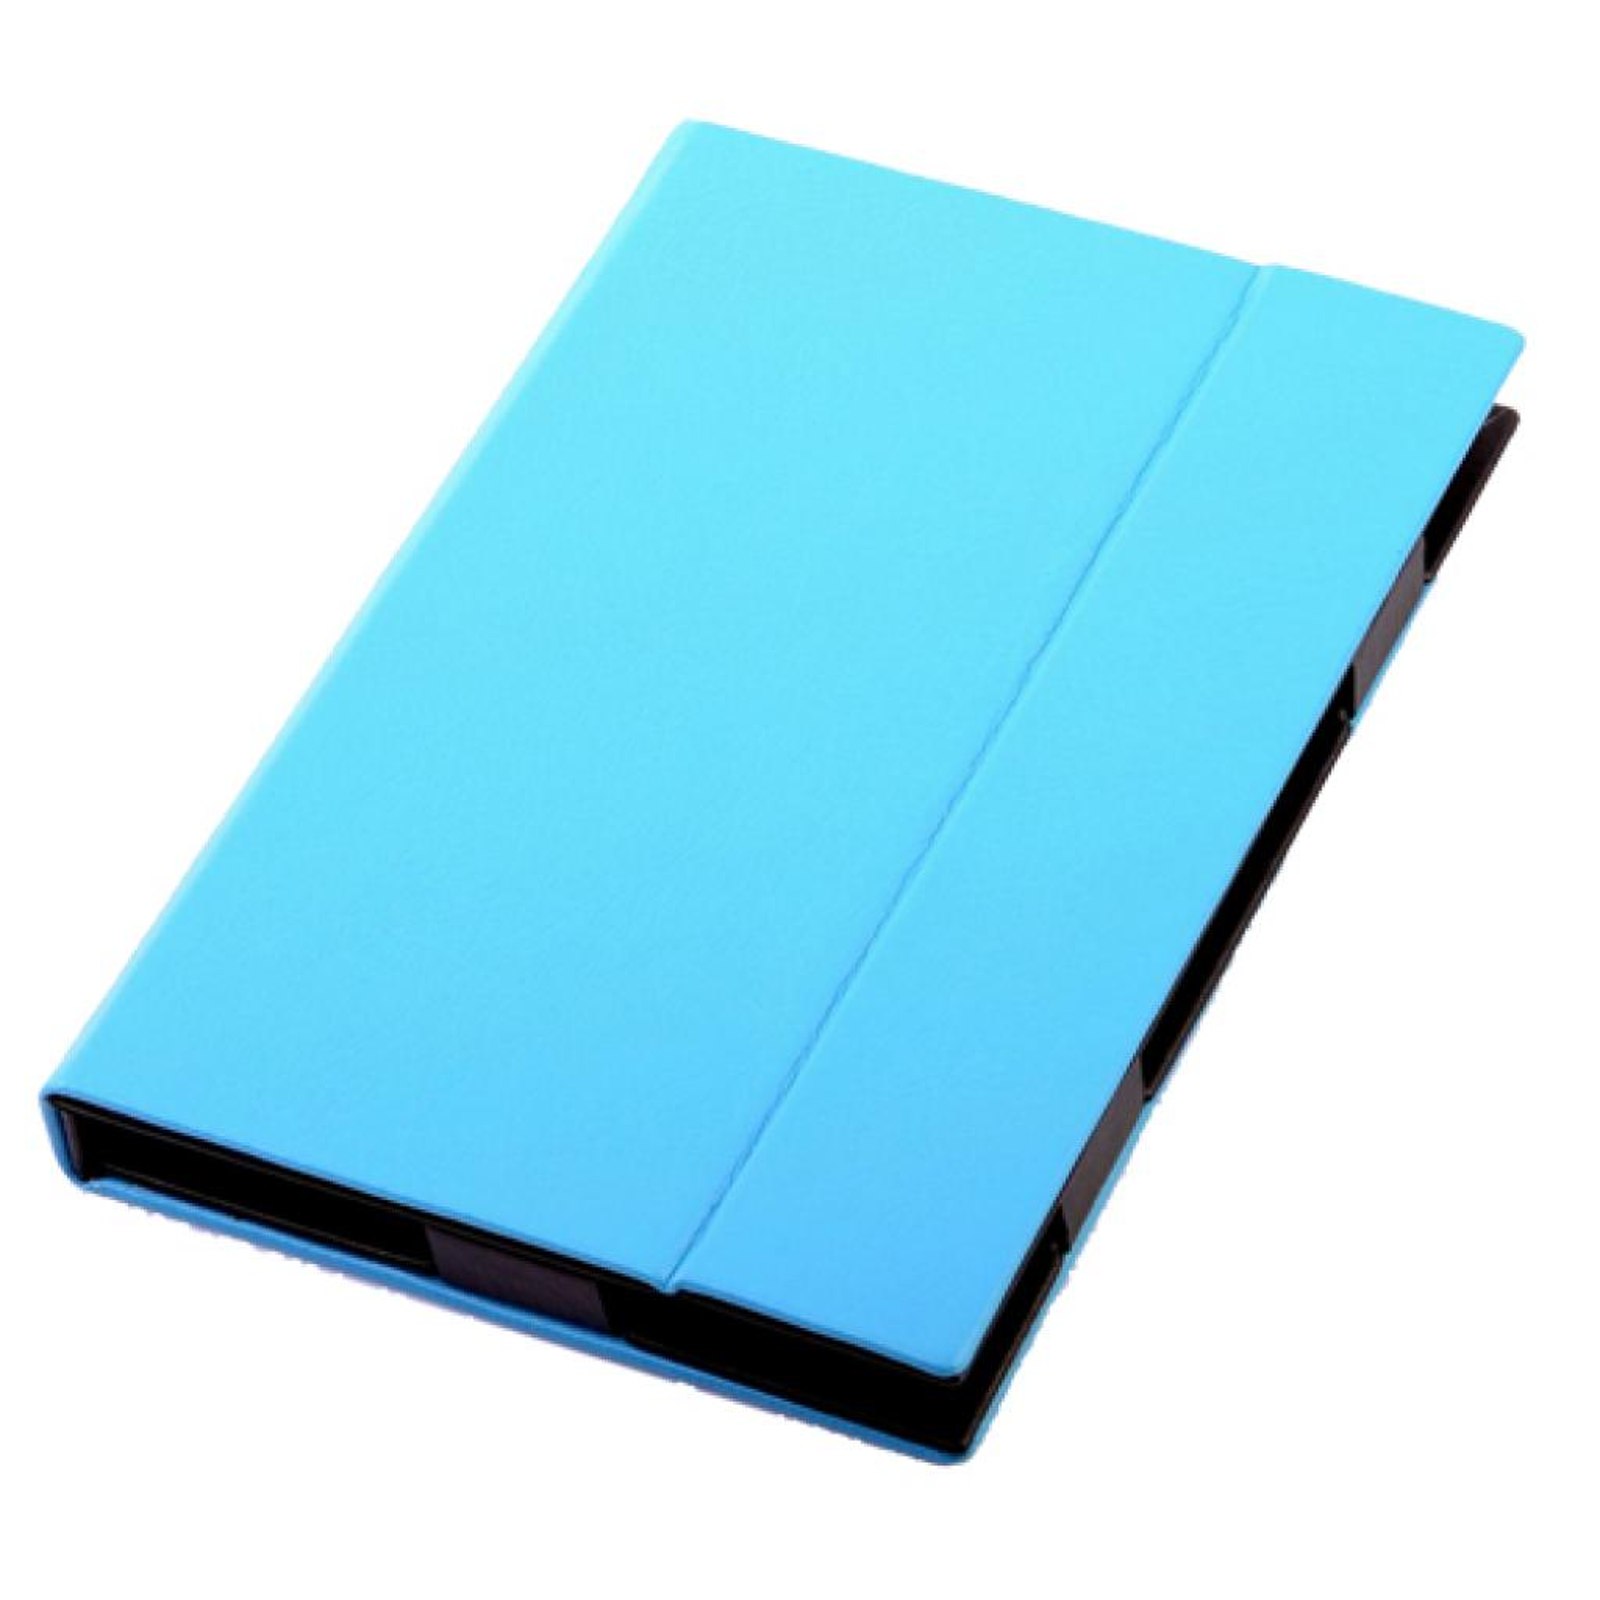 Чехол для планшета Vento 9.7 Desire Bright -blue